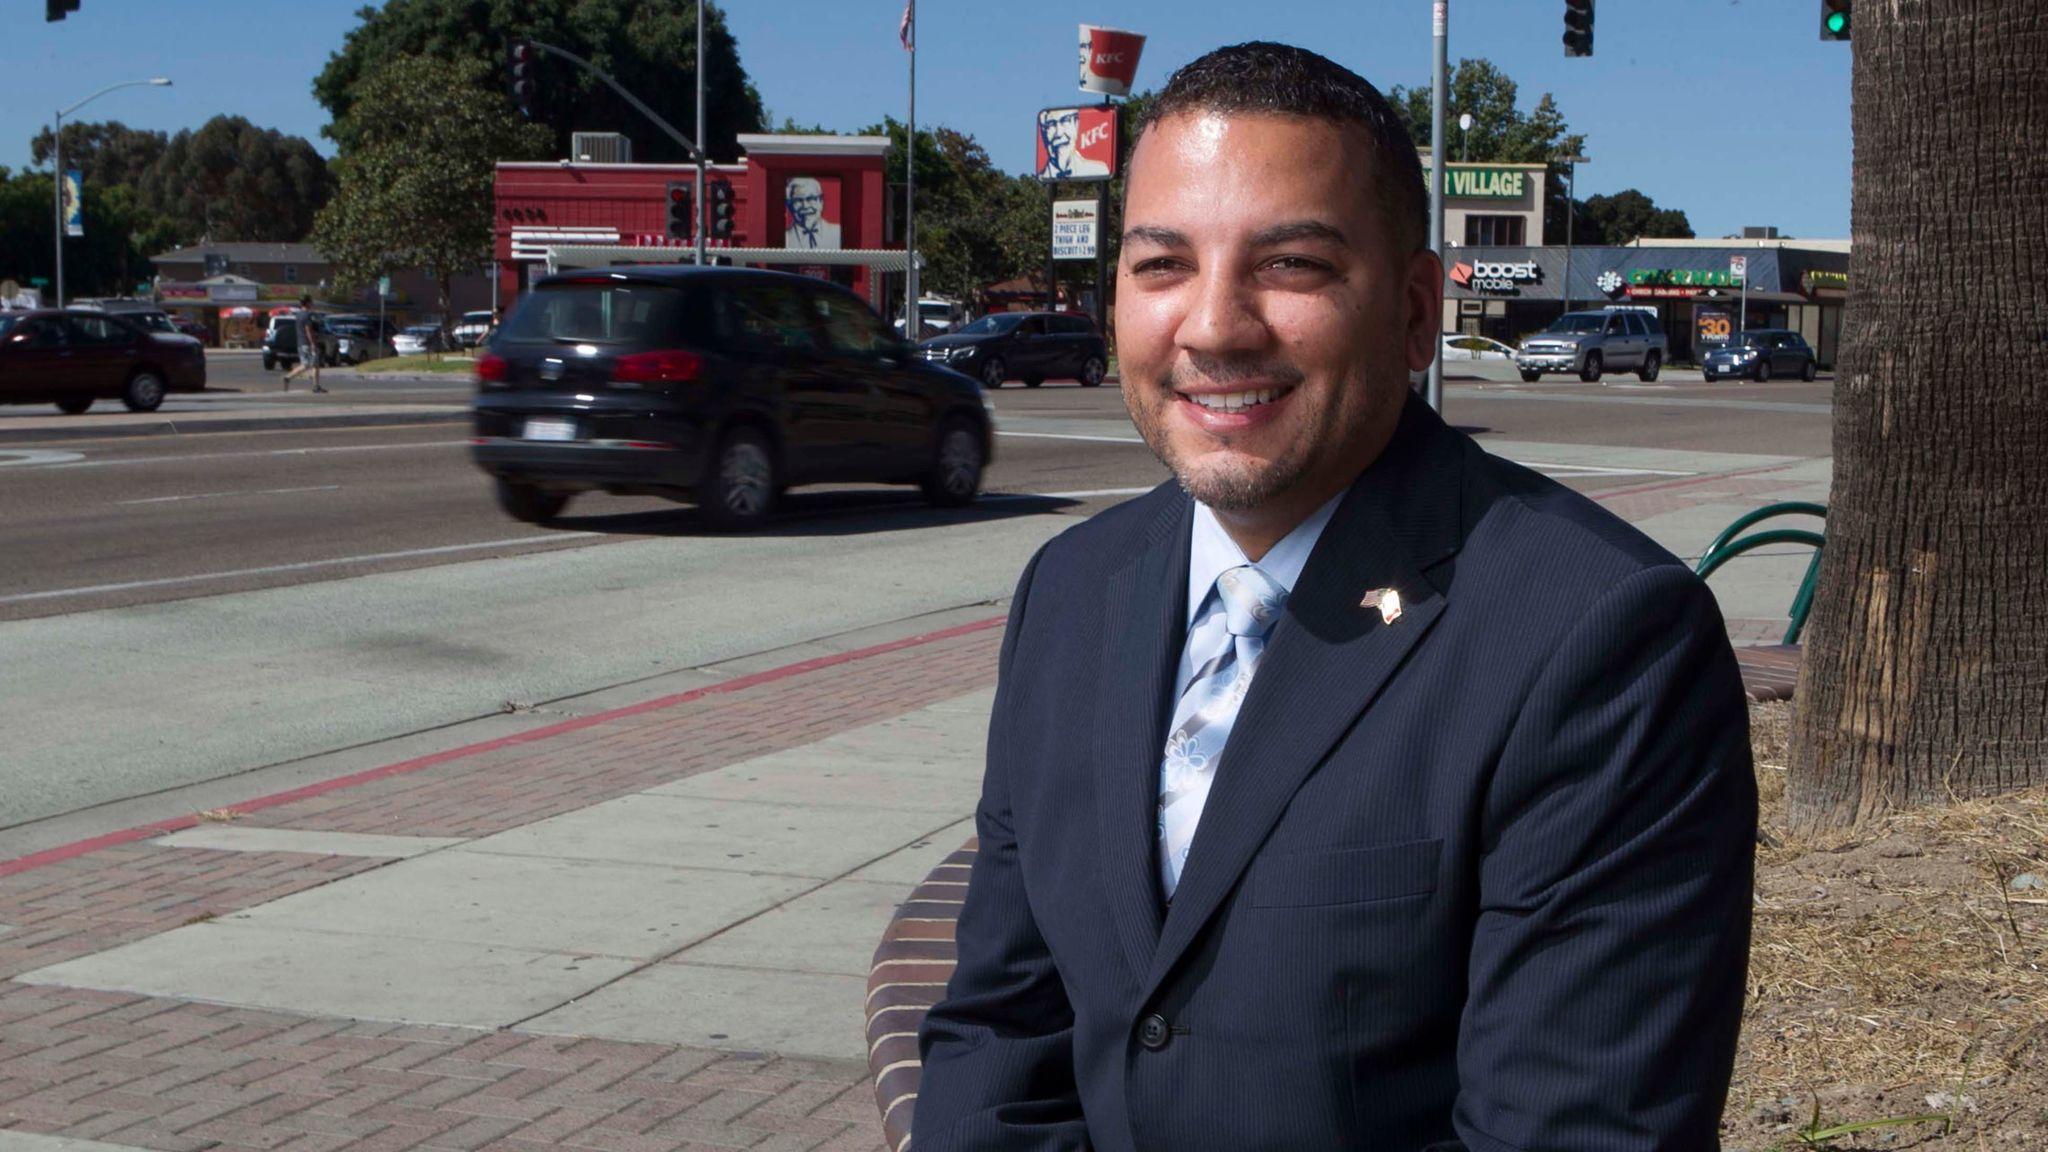 Jason Wells is head of the San Ysidro Chamber of Commerce.